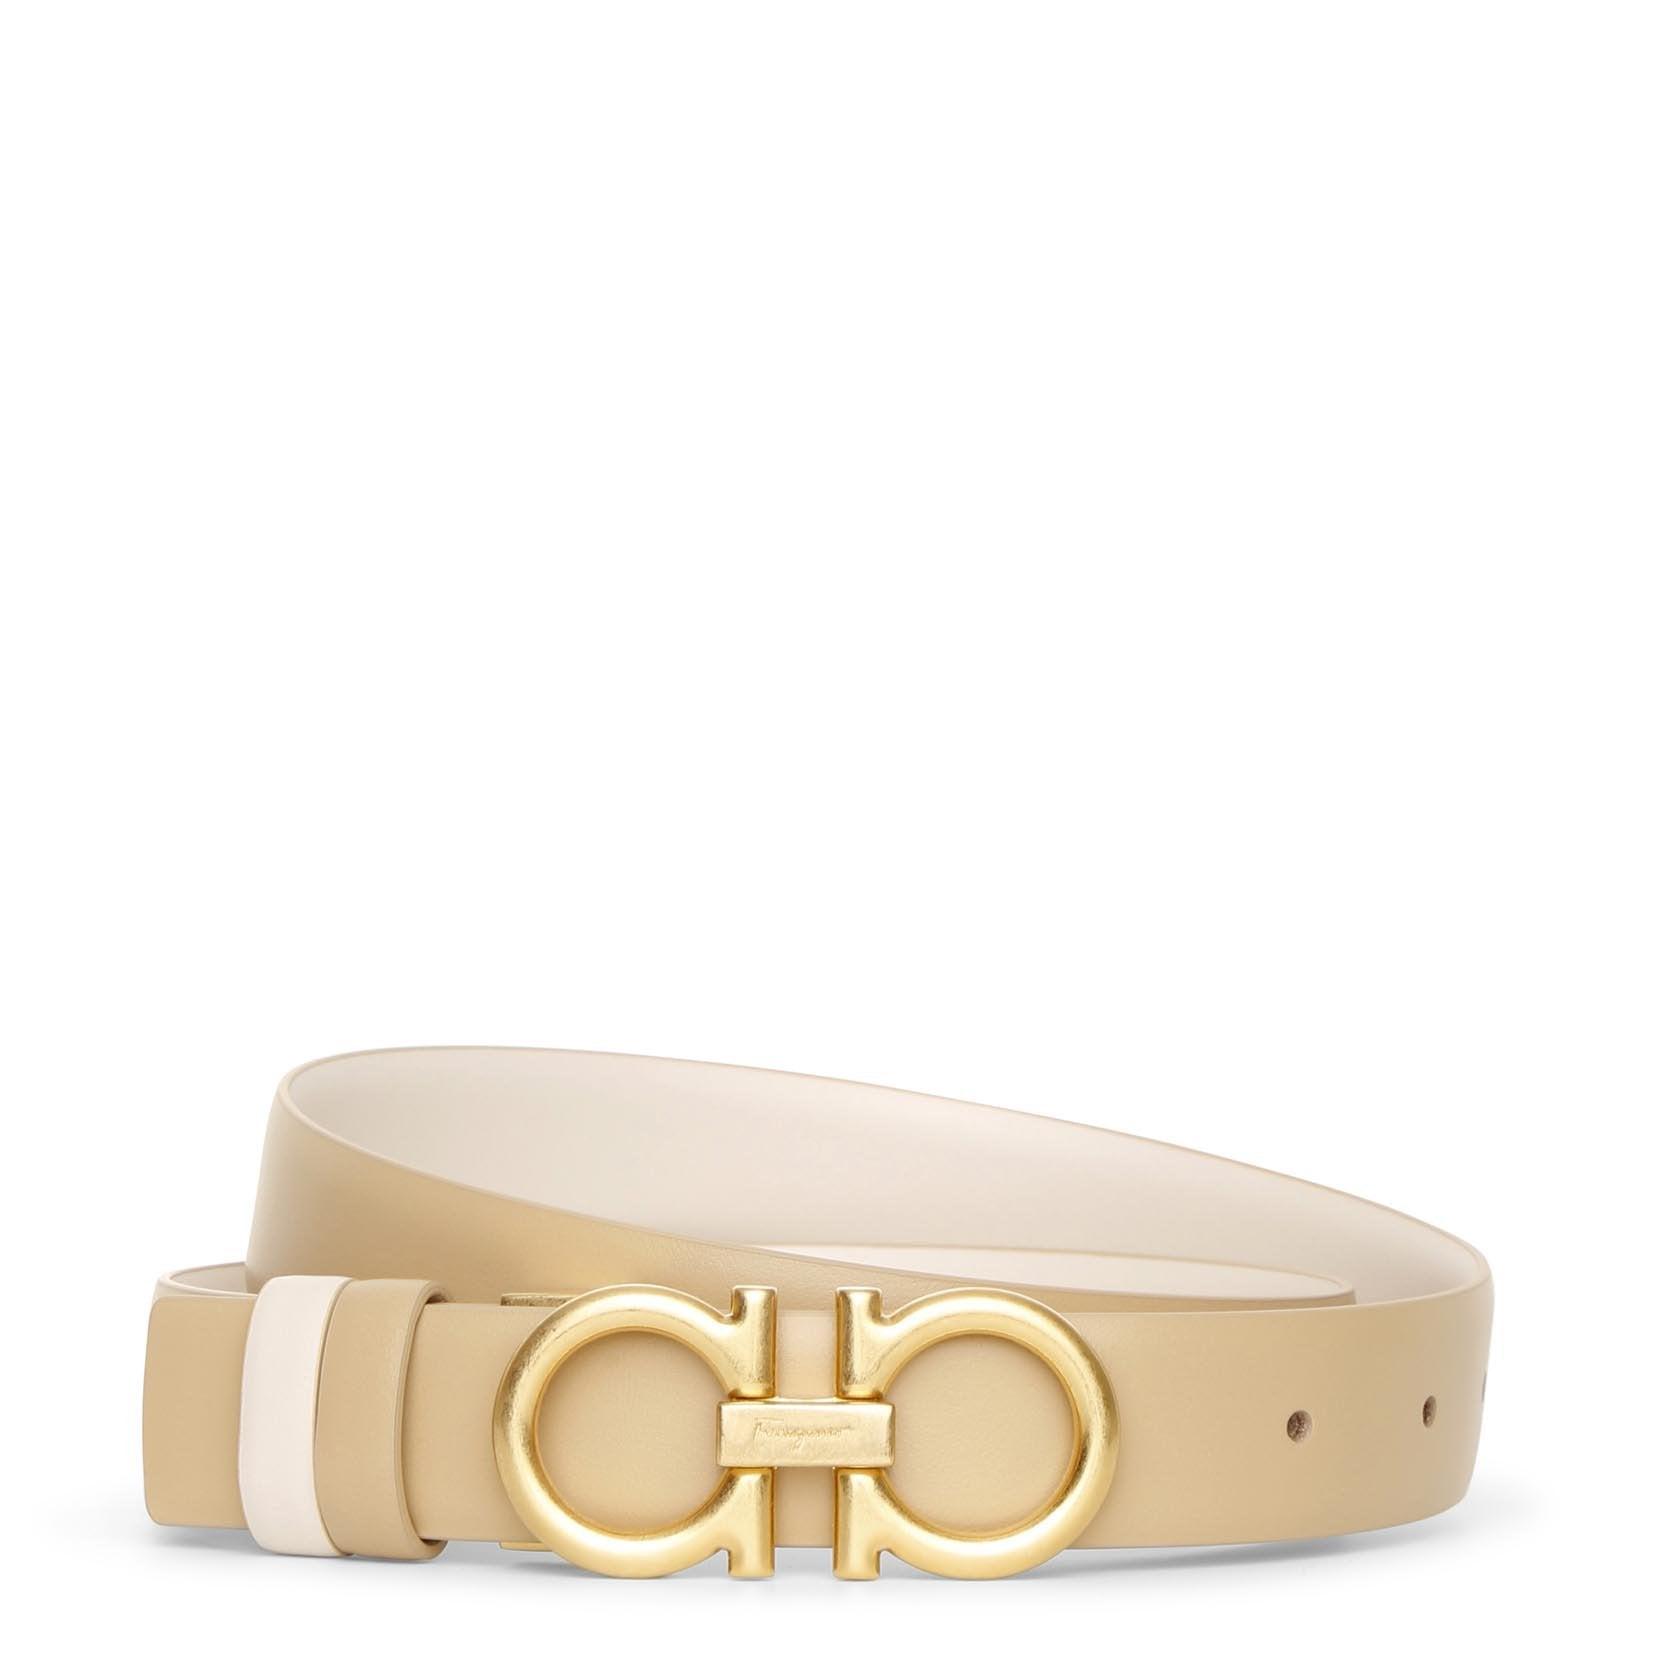 Salvatore Ferragamo Reversable and adjustable beige cream leather belt  - beige/white - female - Size: 85